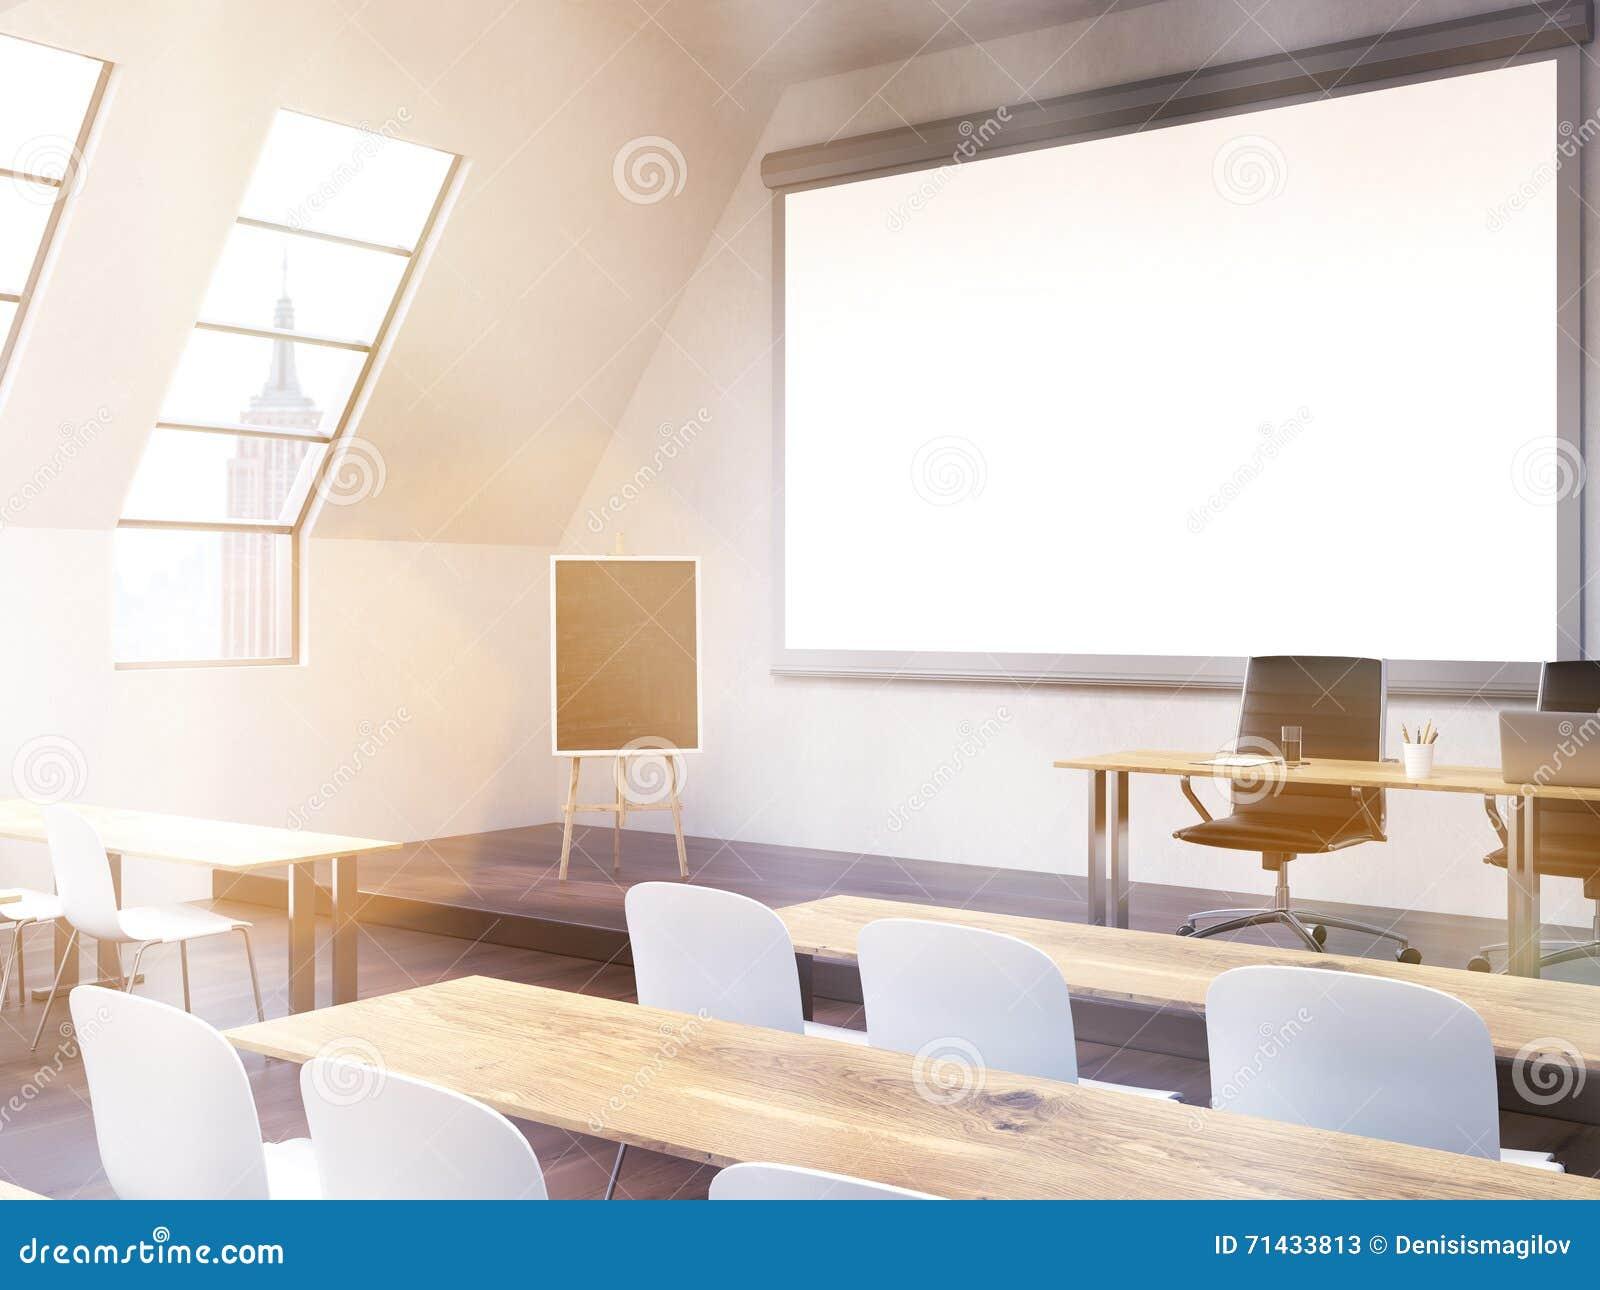 Classroom Blackboard Design ~ Classroom with ny view toning stock illustration image